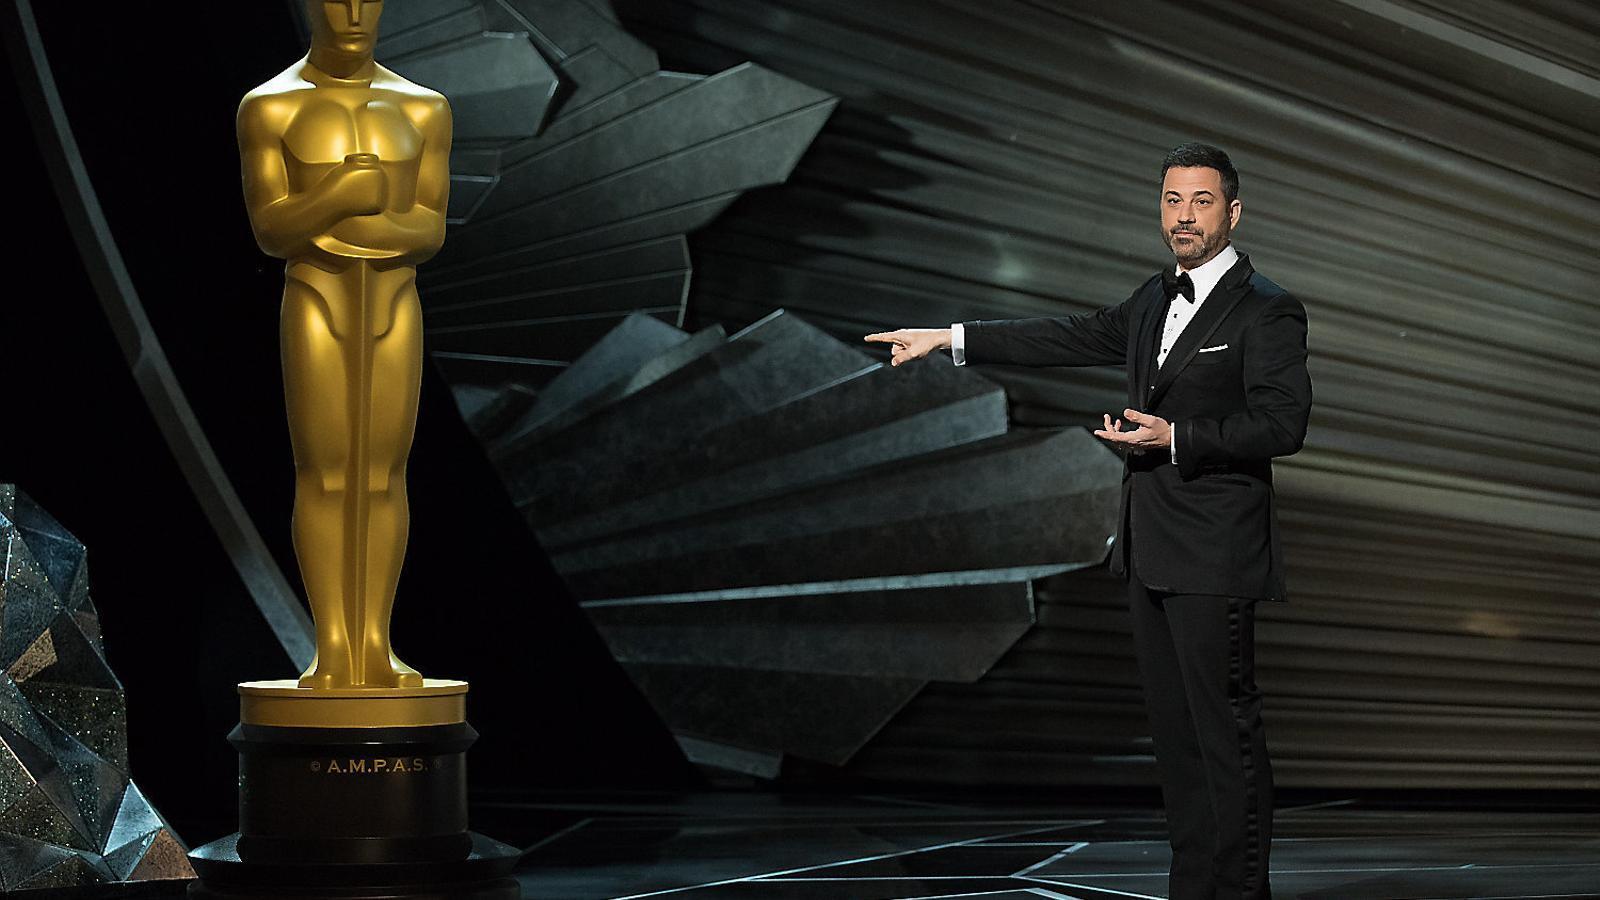 L'Oscar al film popular, una idea impopular a Hollywood